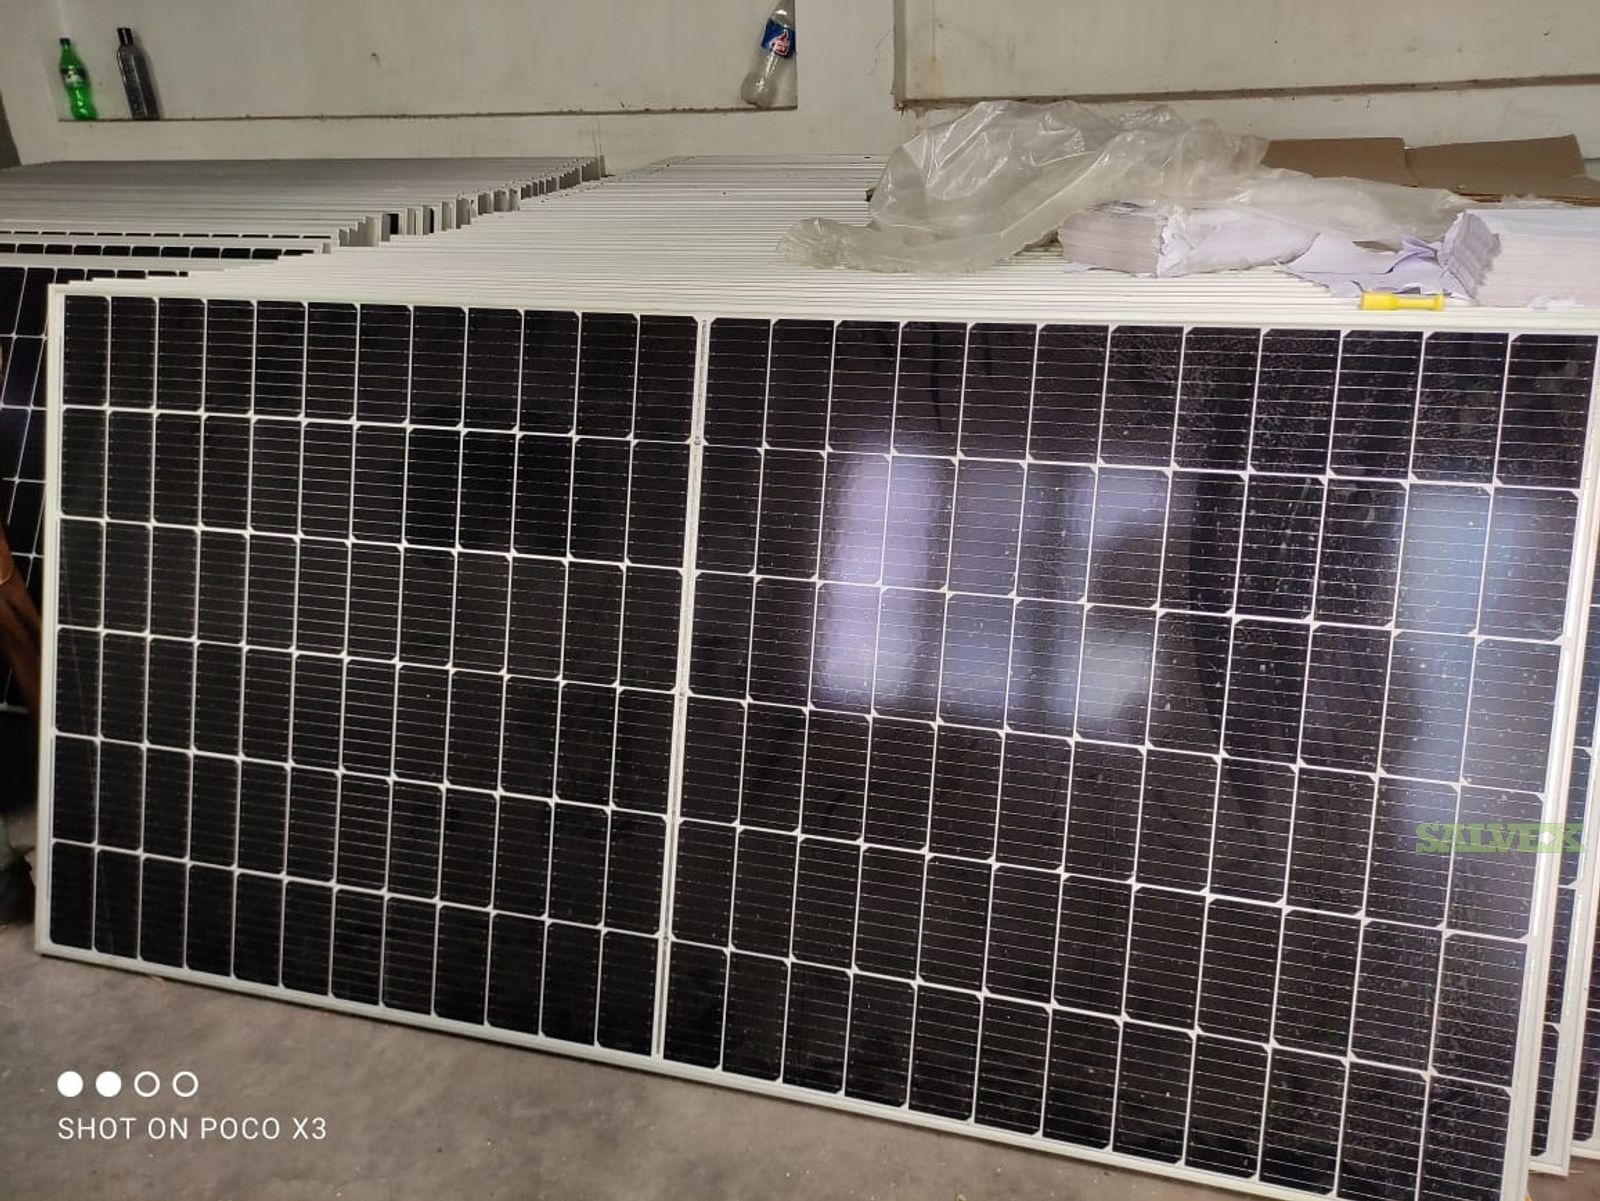 Trina 445W Solar Modules (140 Modules)